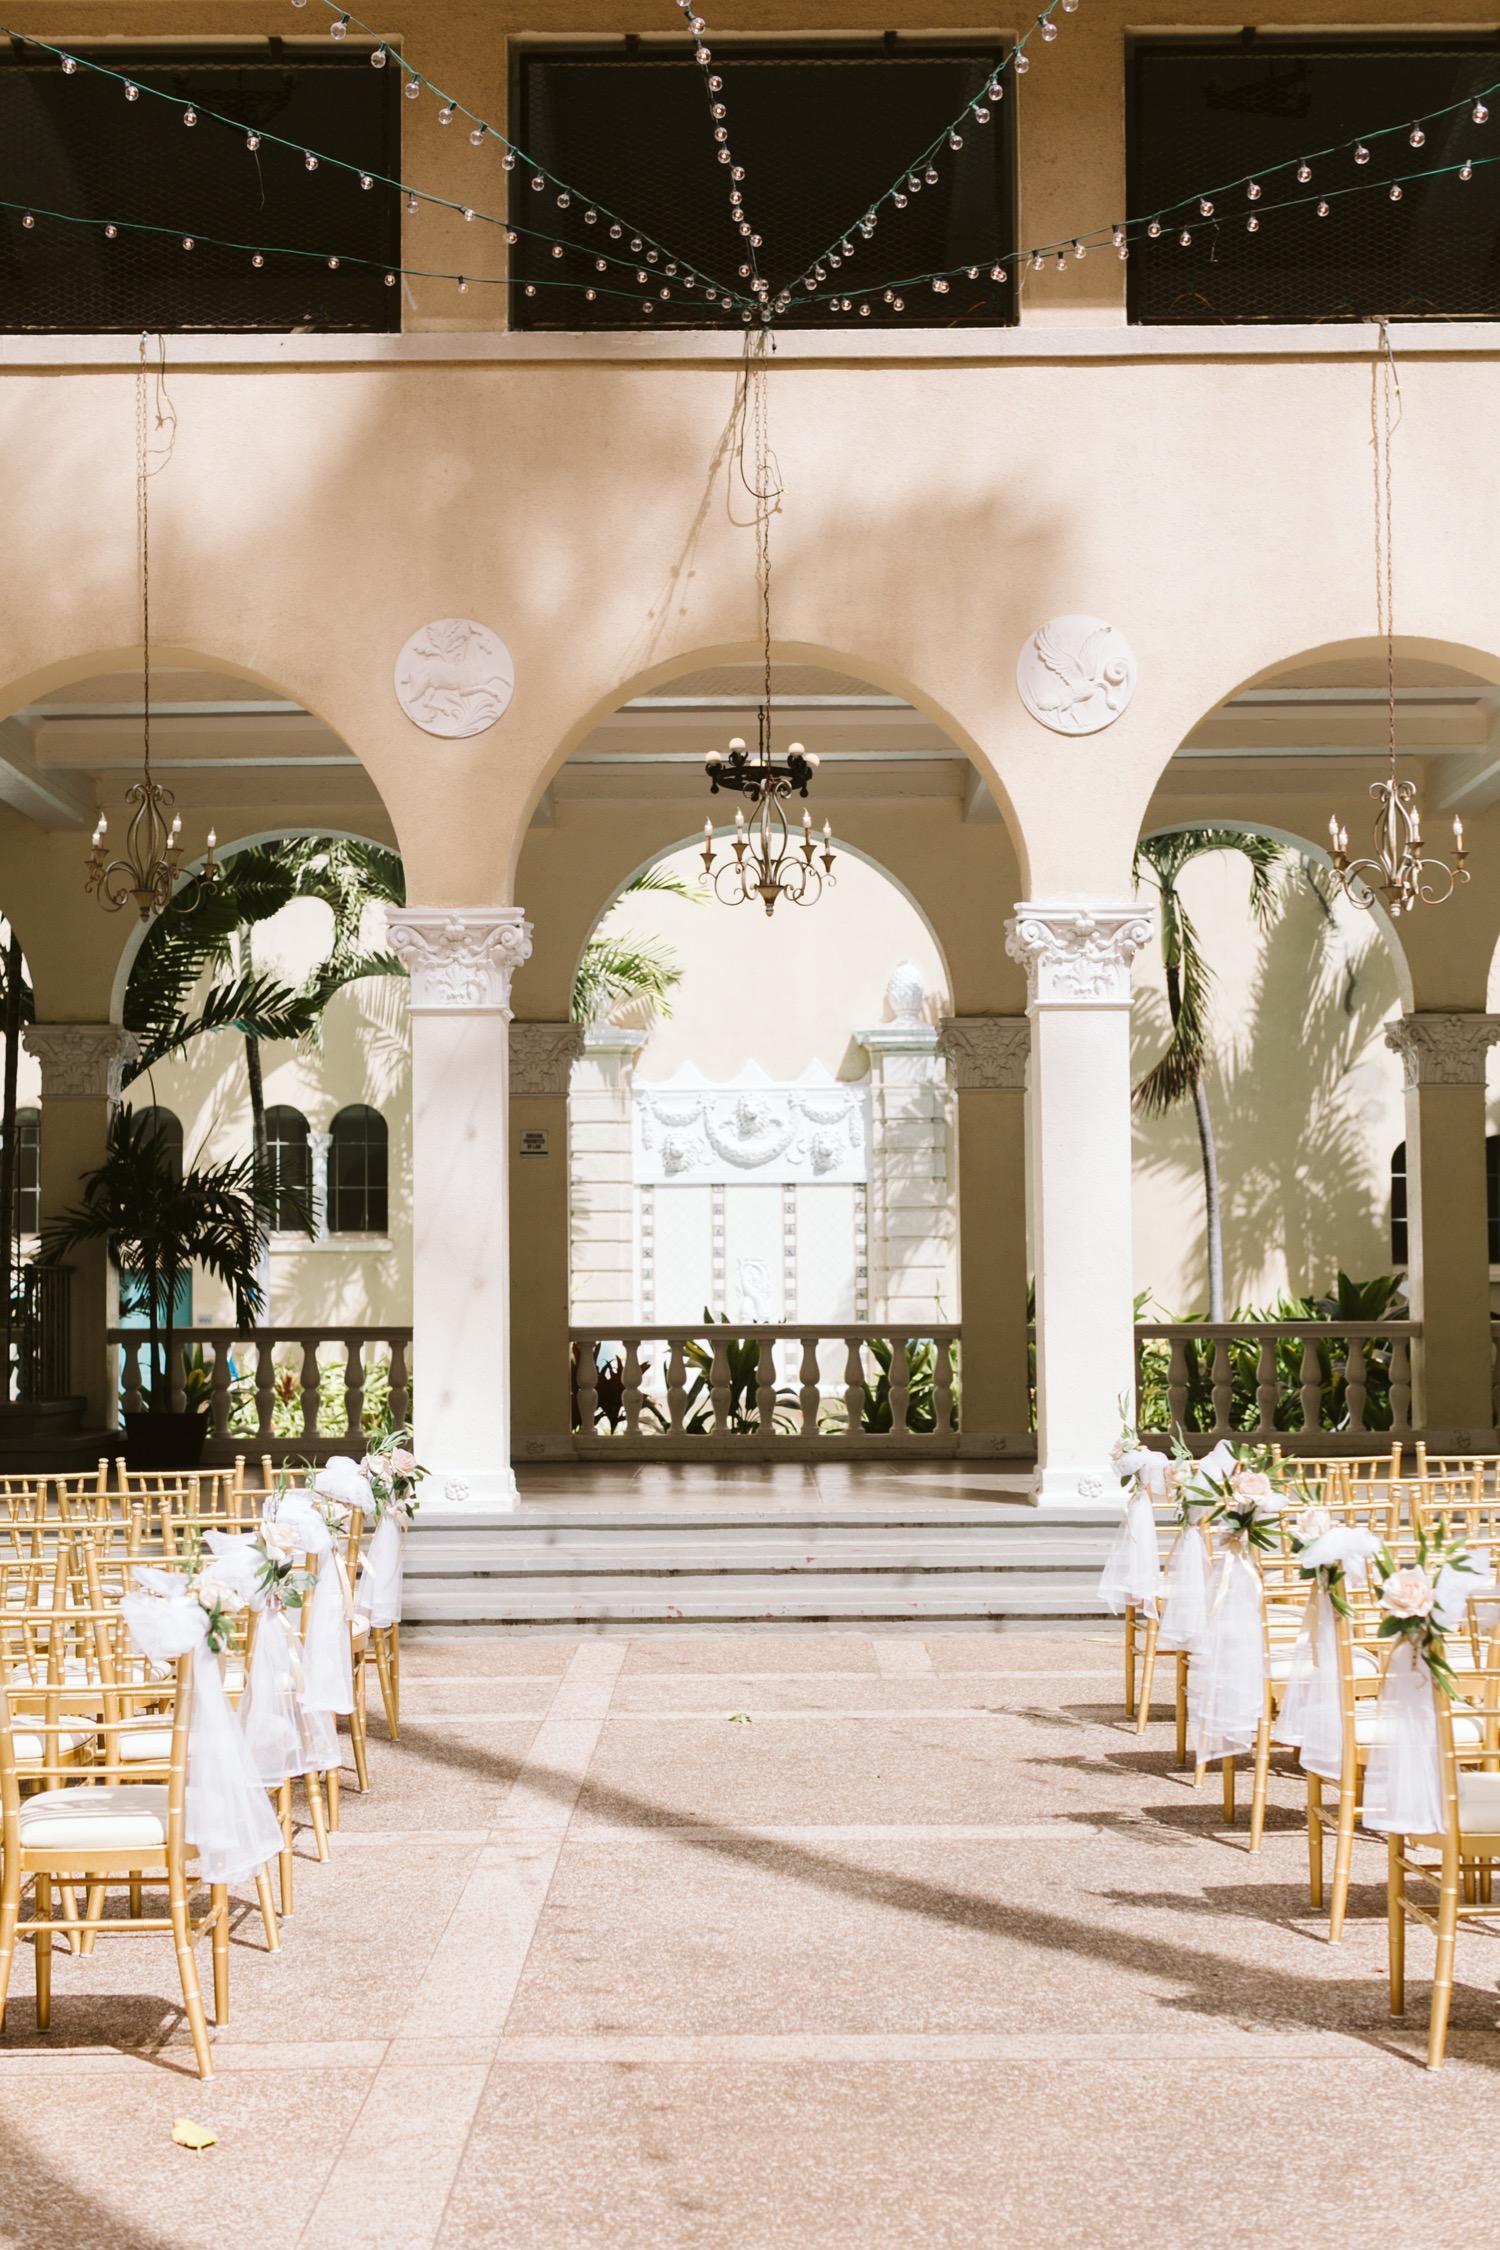 004_Brayden-Julianne-Wedding-49_Cafe_Ceremony_Julia_Wedding.jpg